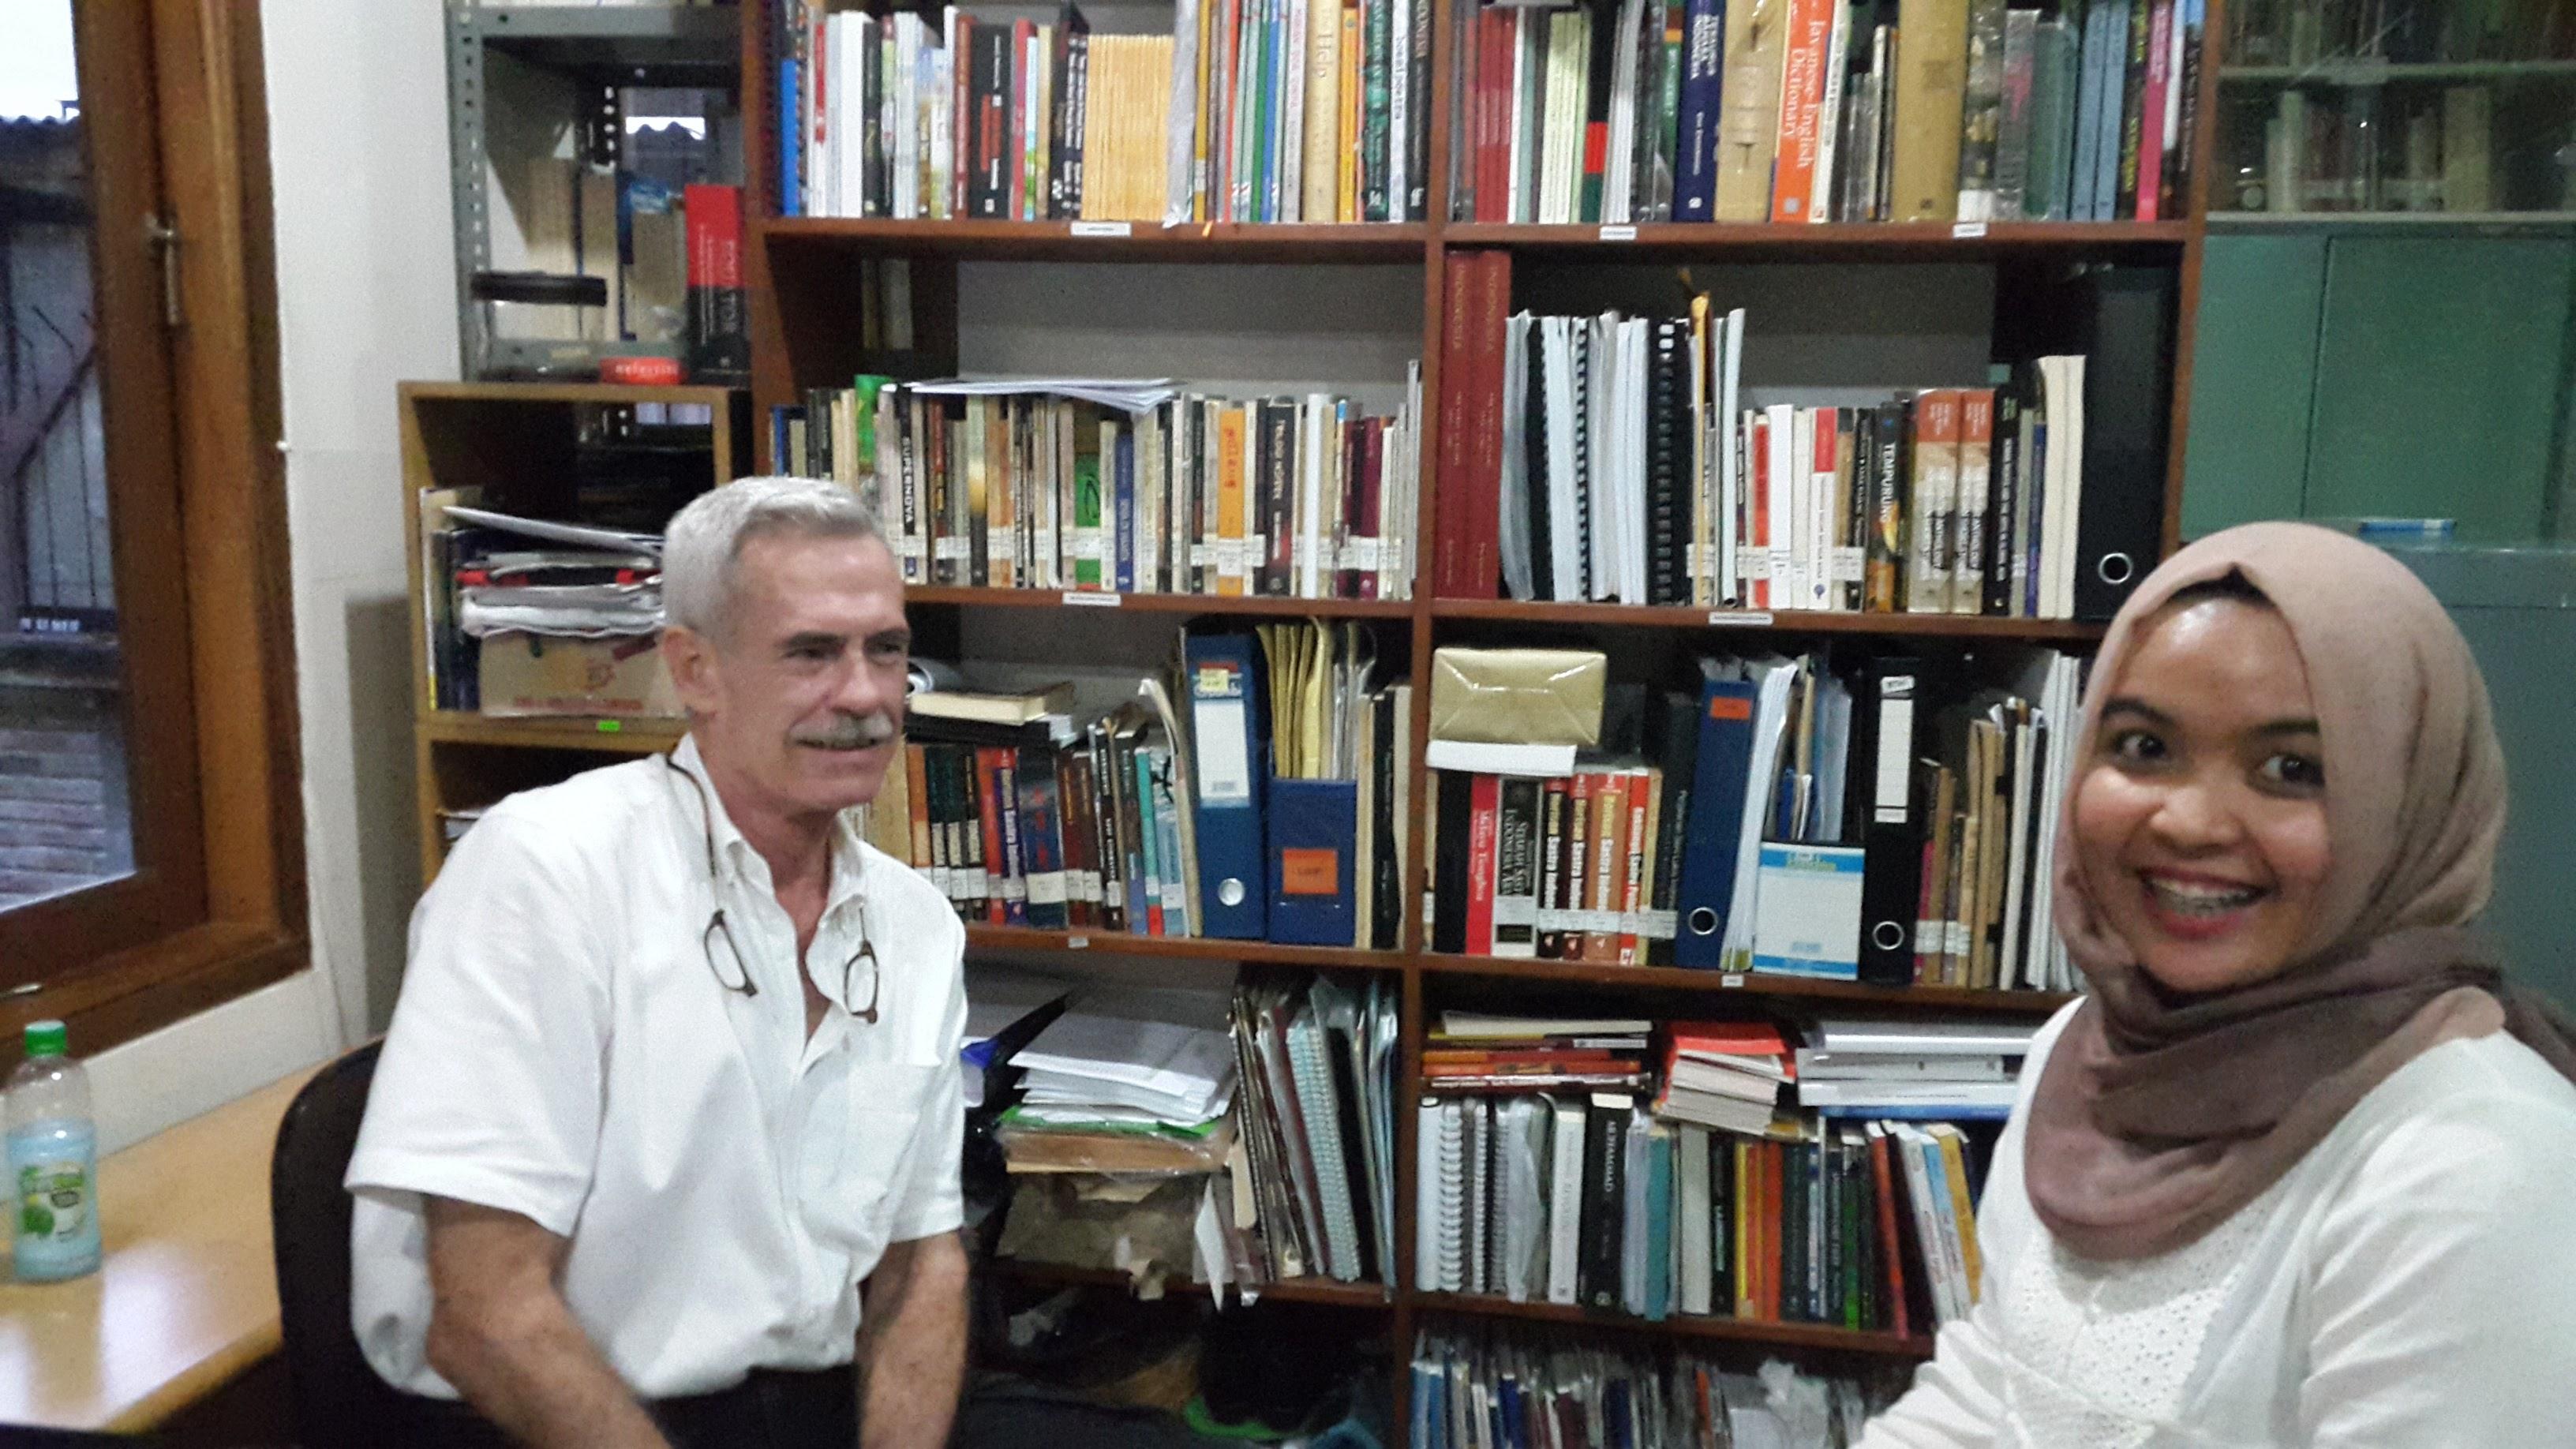 John McGlynn in Conversation with Espiralina Puspa Tania